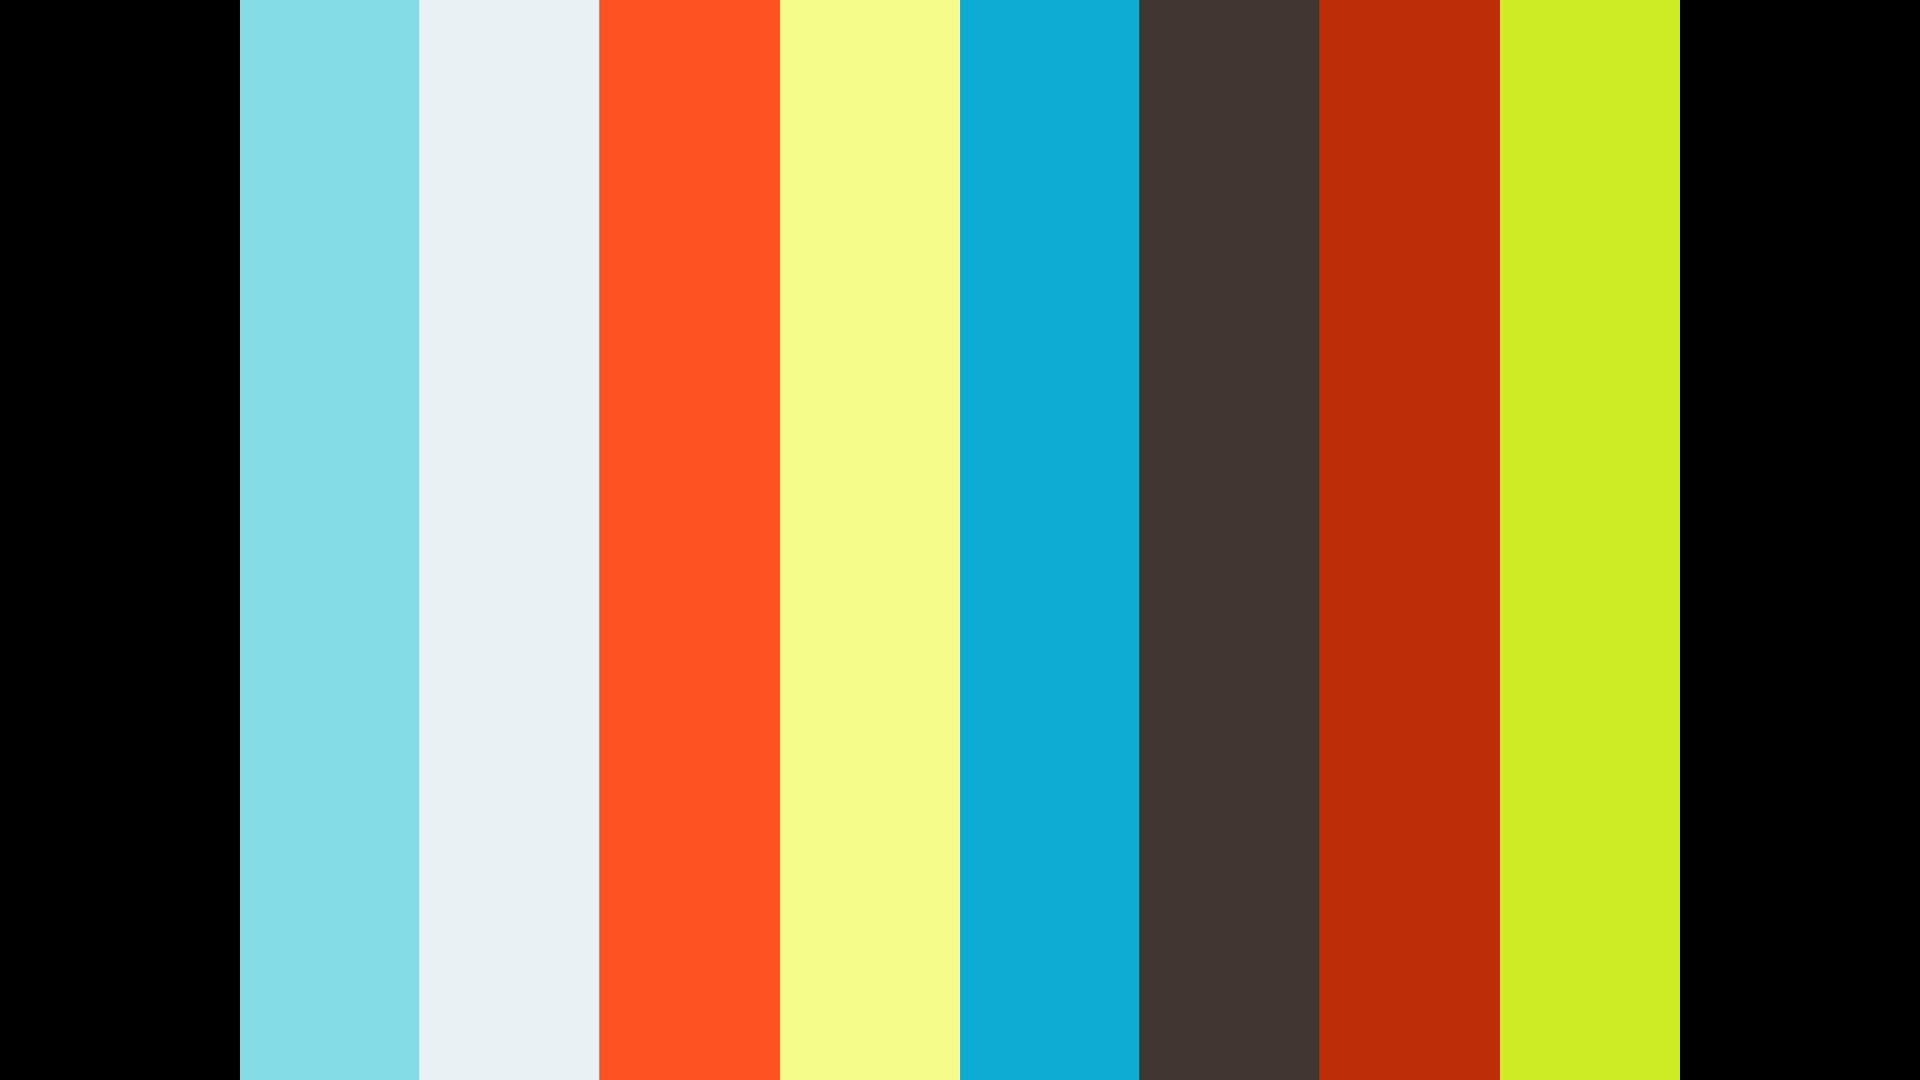 Episode 54 Kat Locke-Jones - SL24 Unlocke the Light